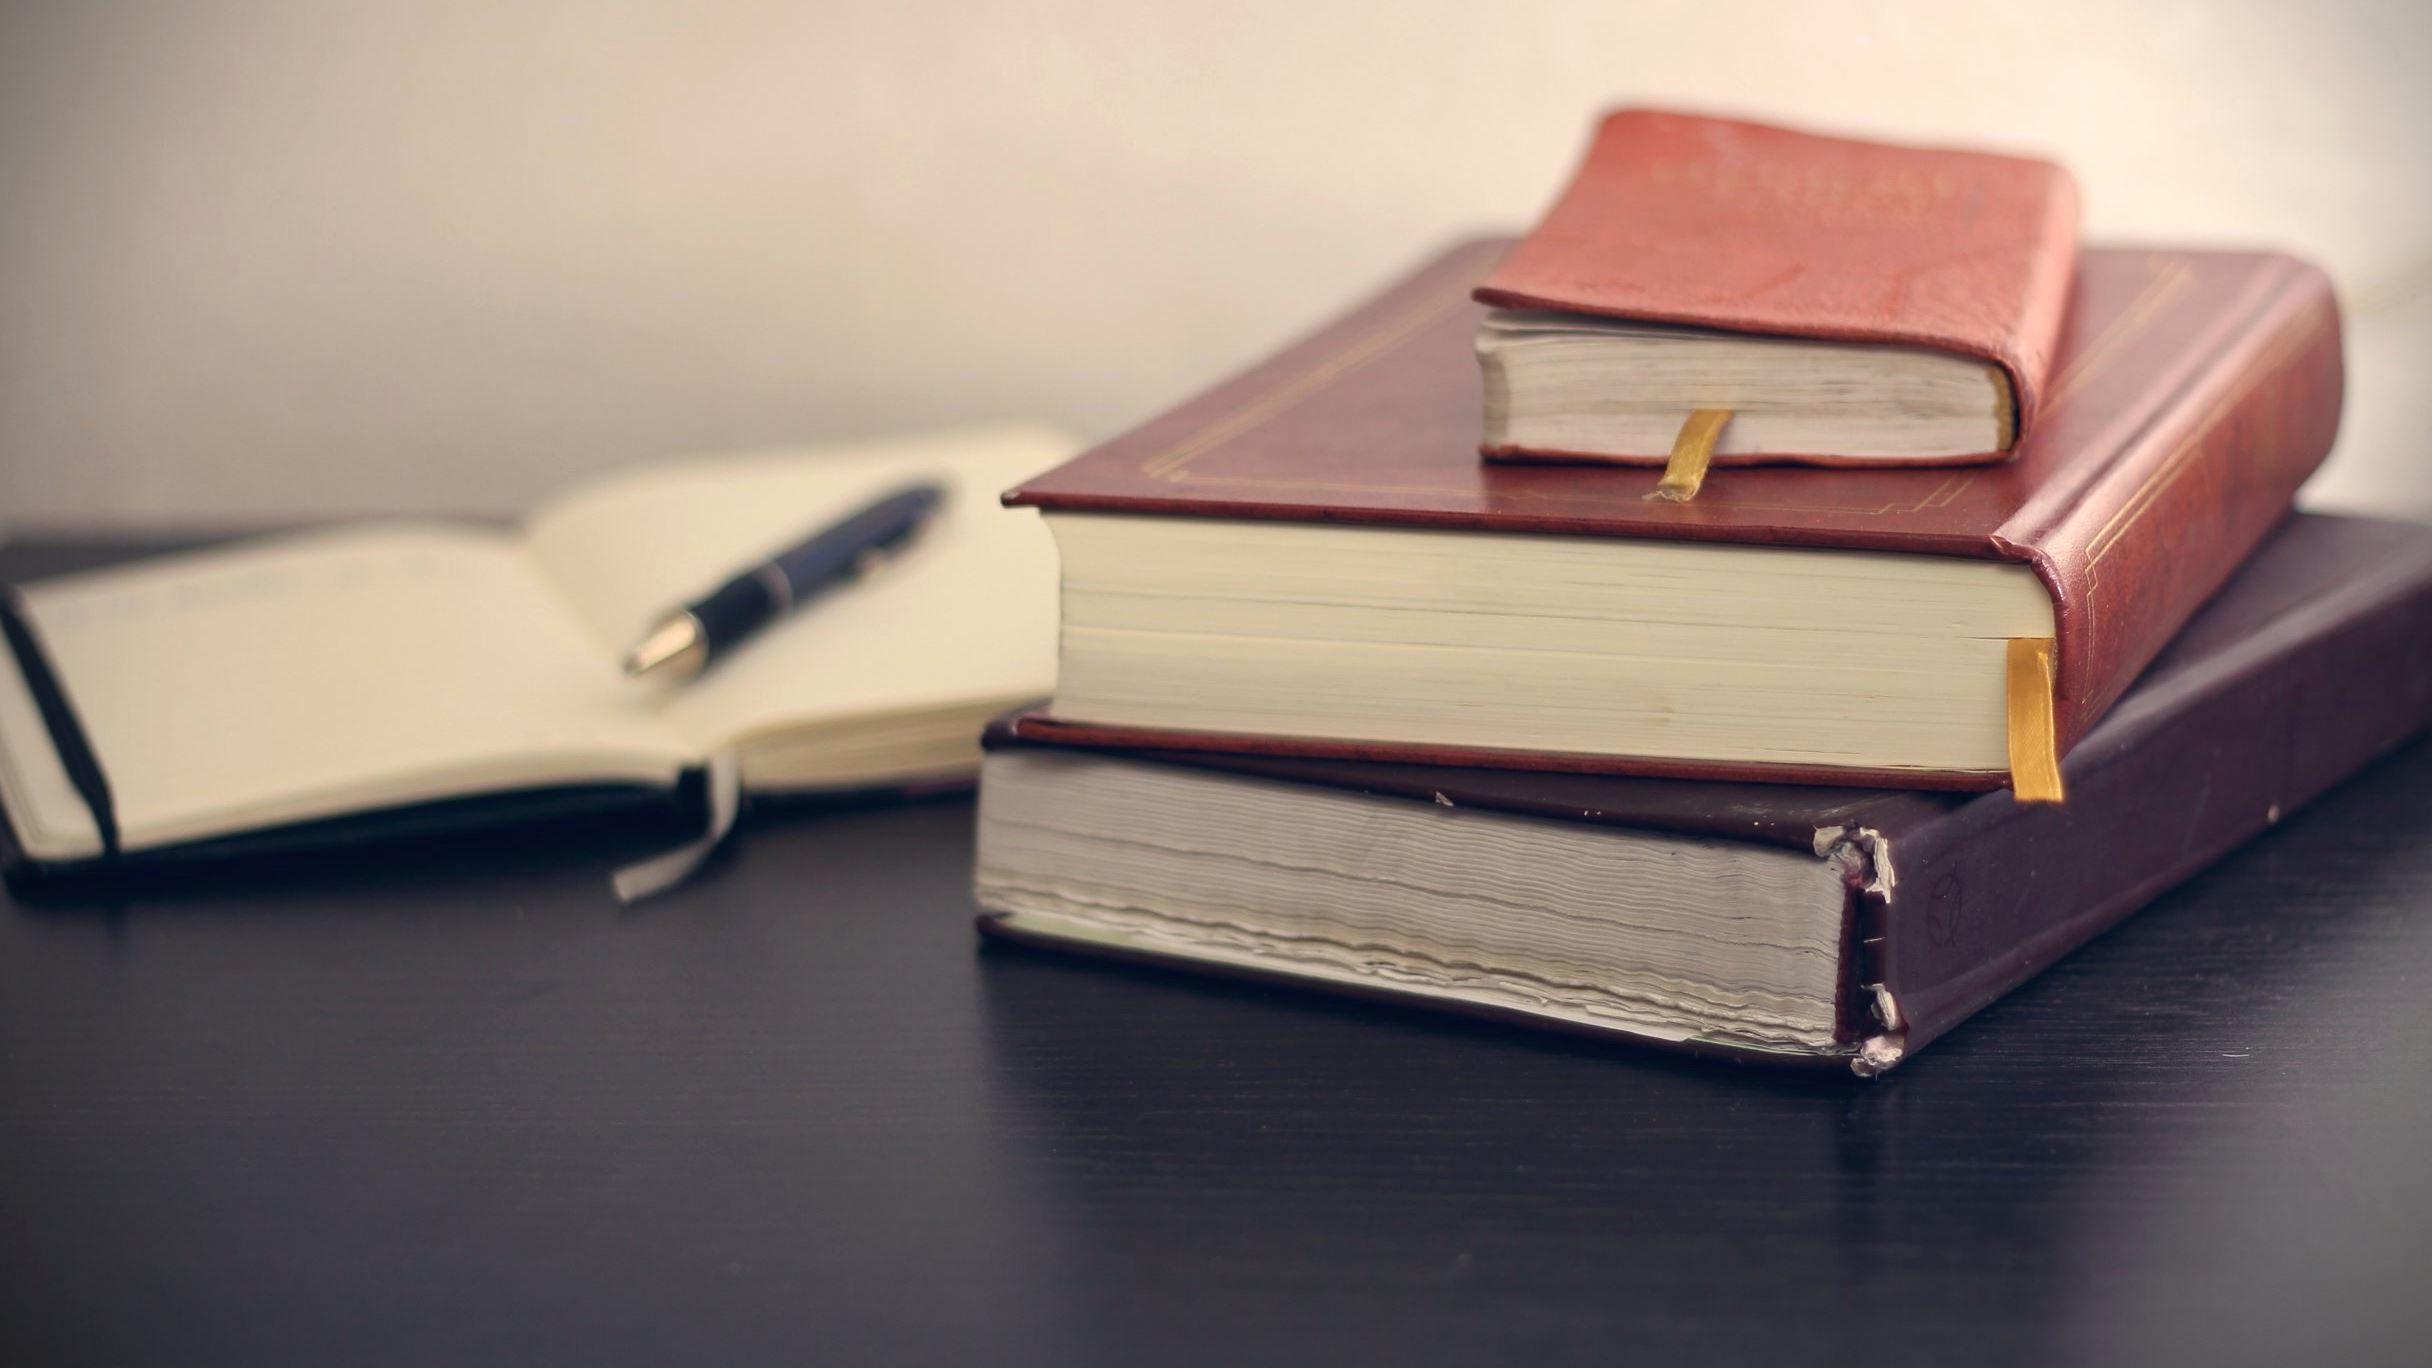 Imagen gratis: cuaderno, lápiz, libros